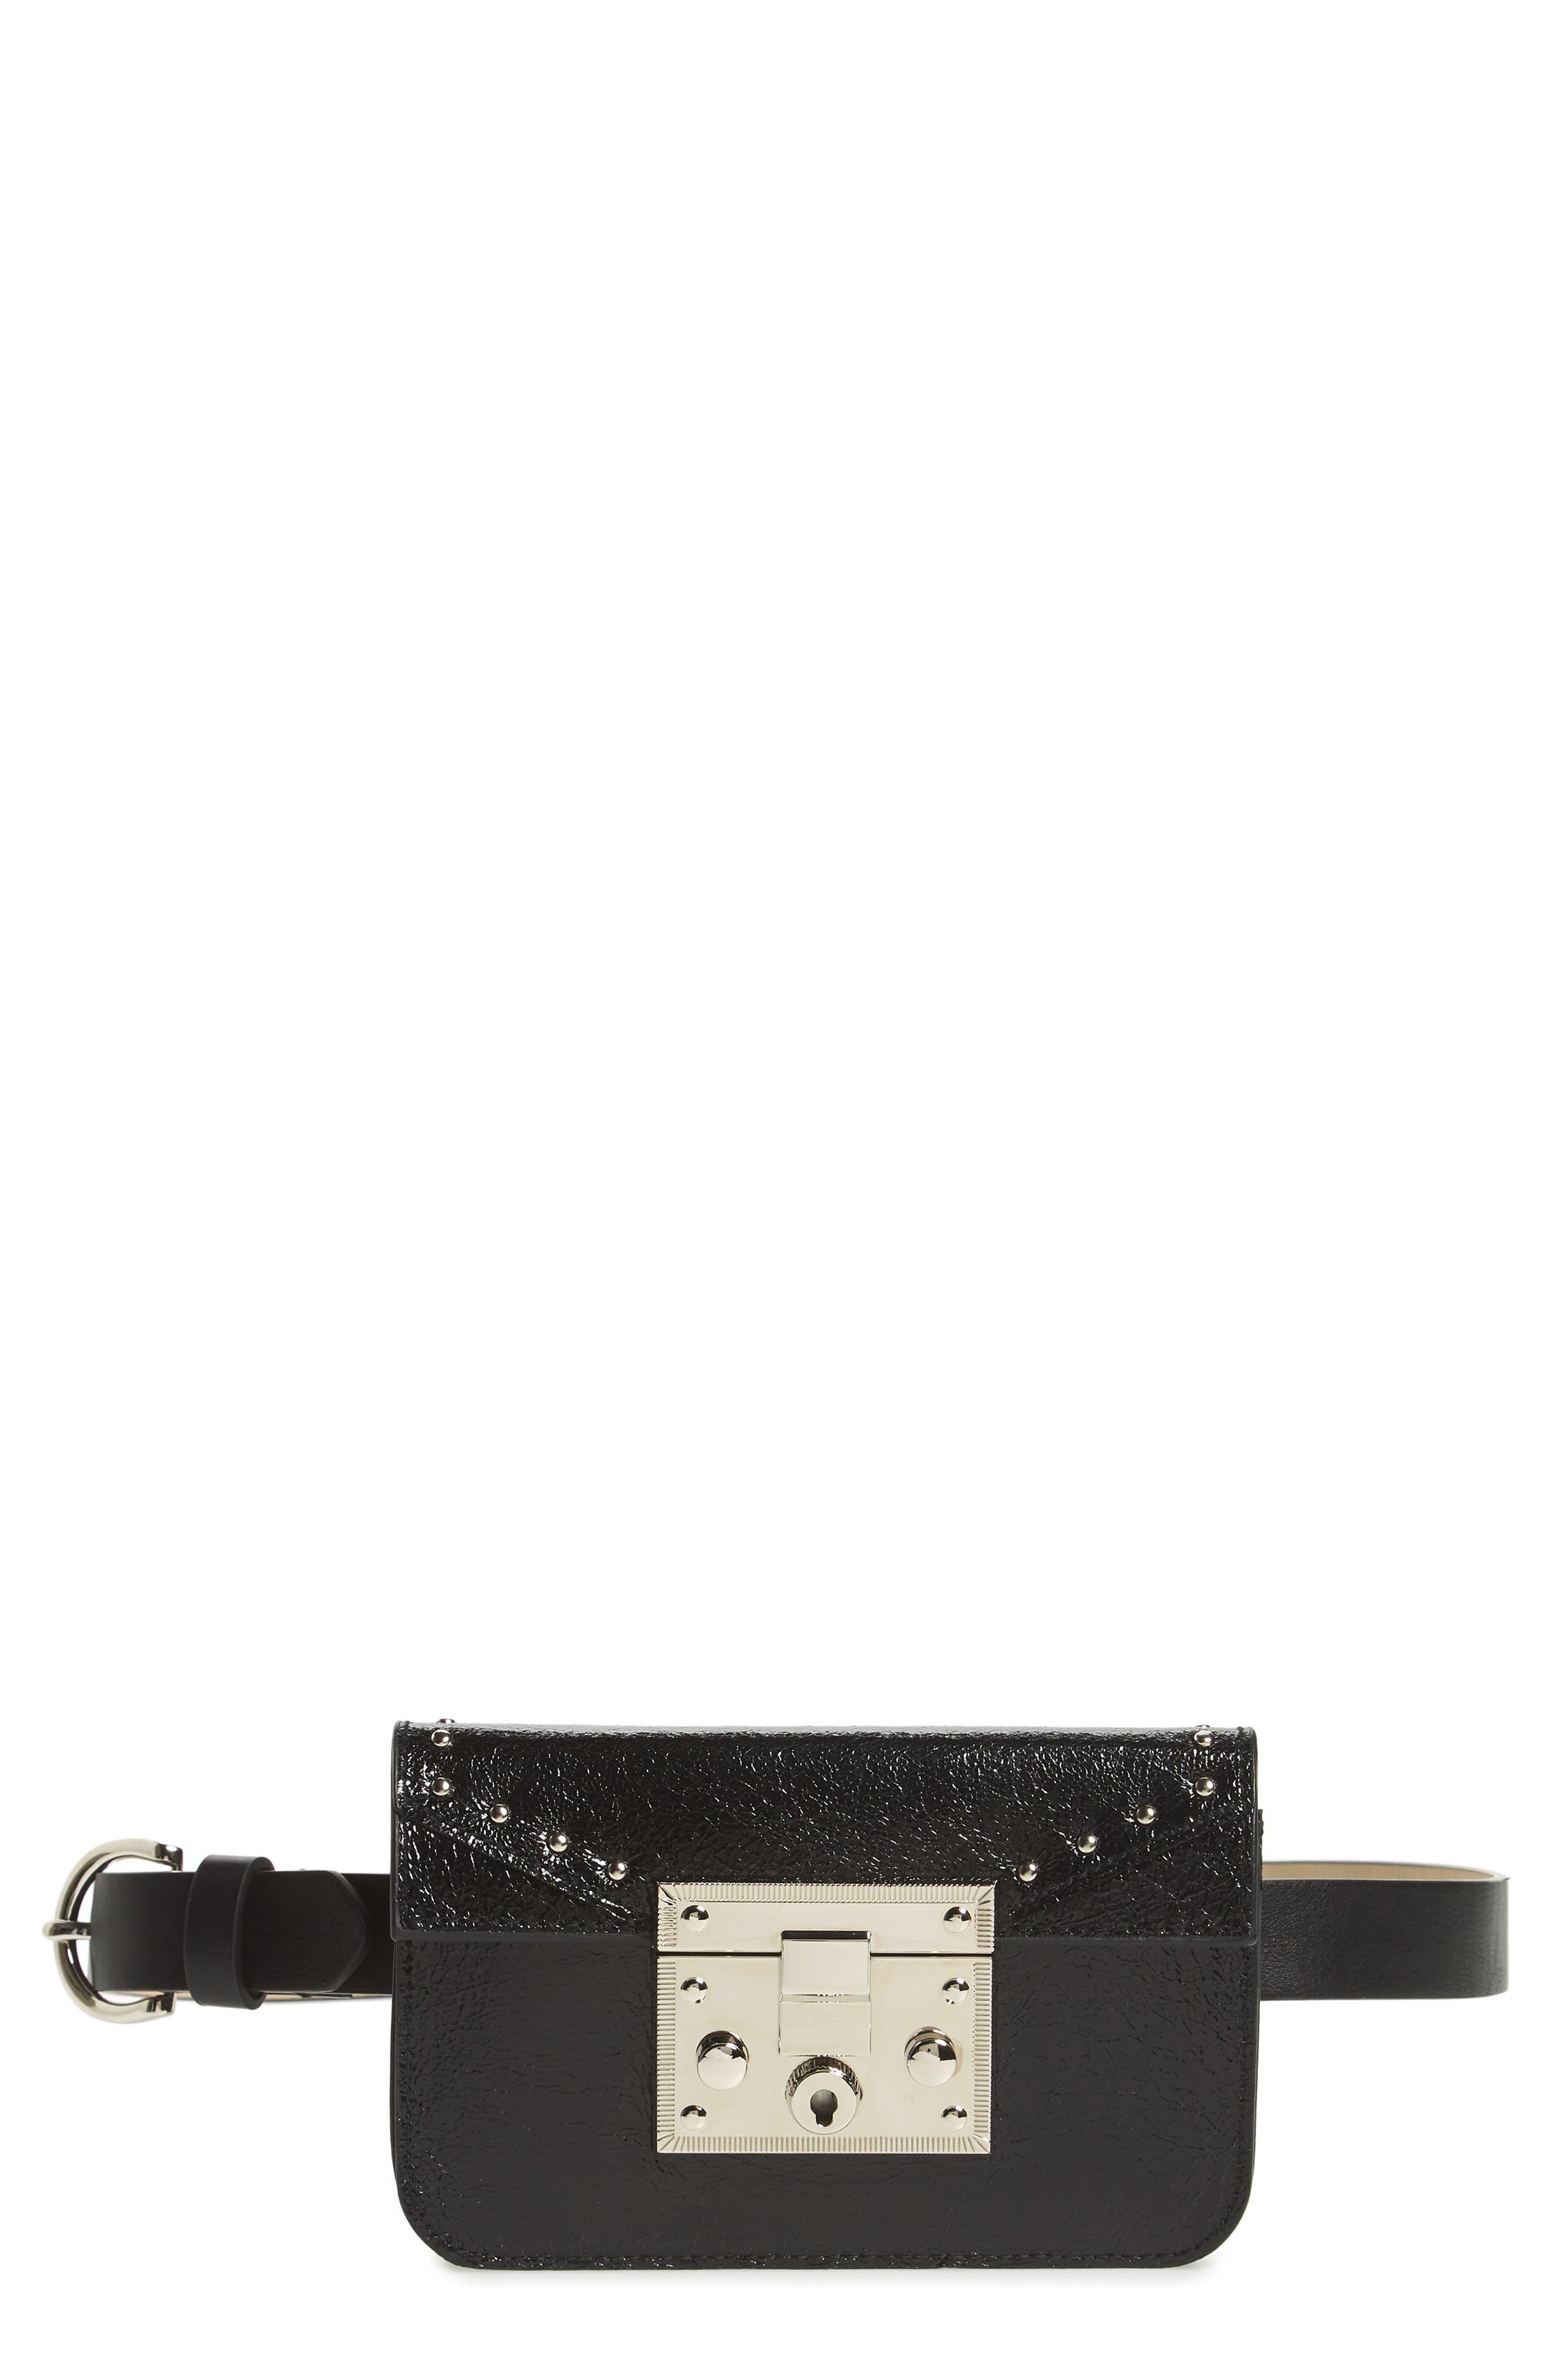 Alternate Image 1 Selected - Steve Madden Hardware Belt Bag